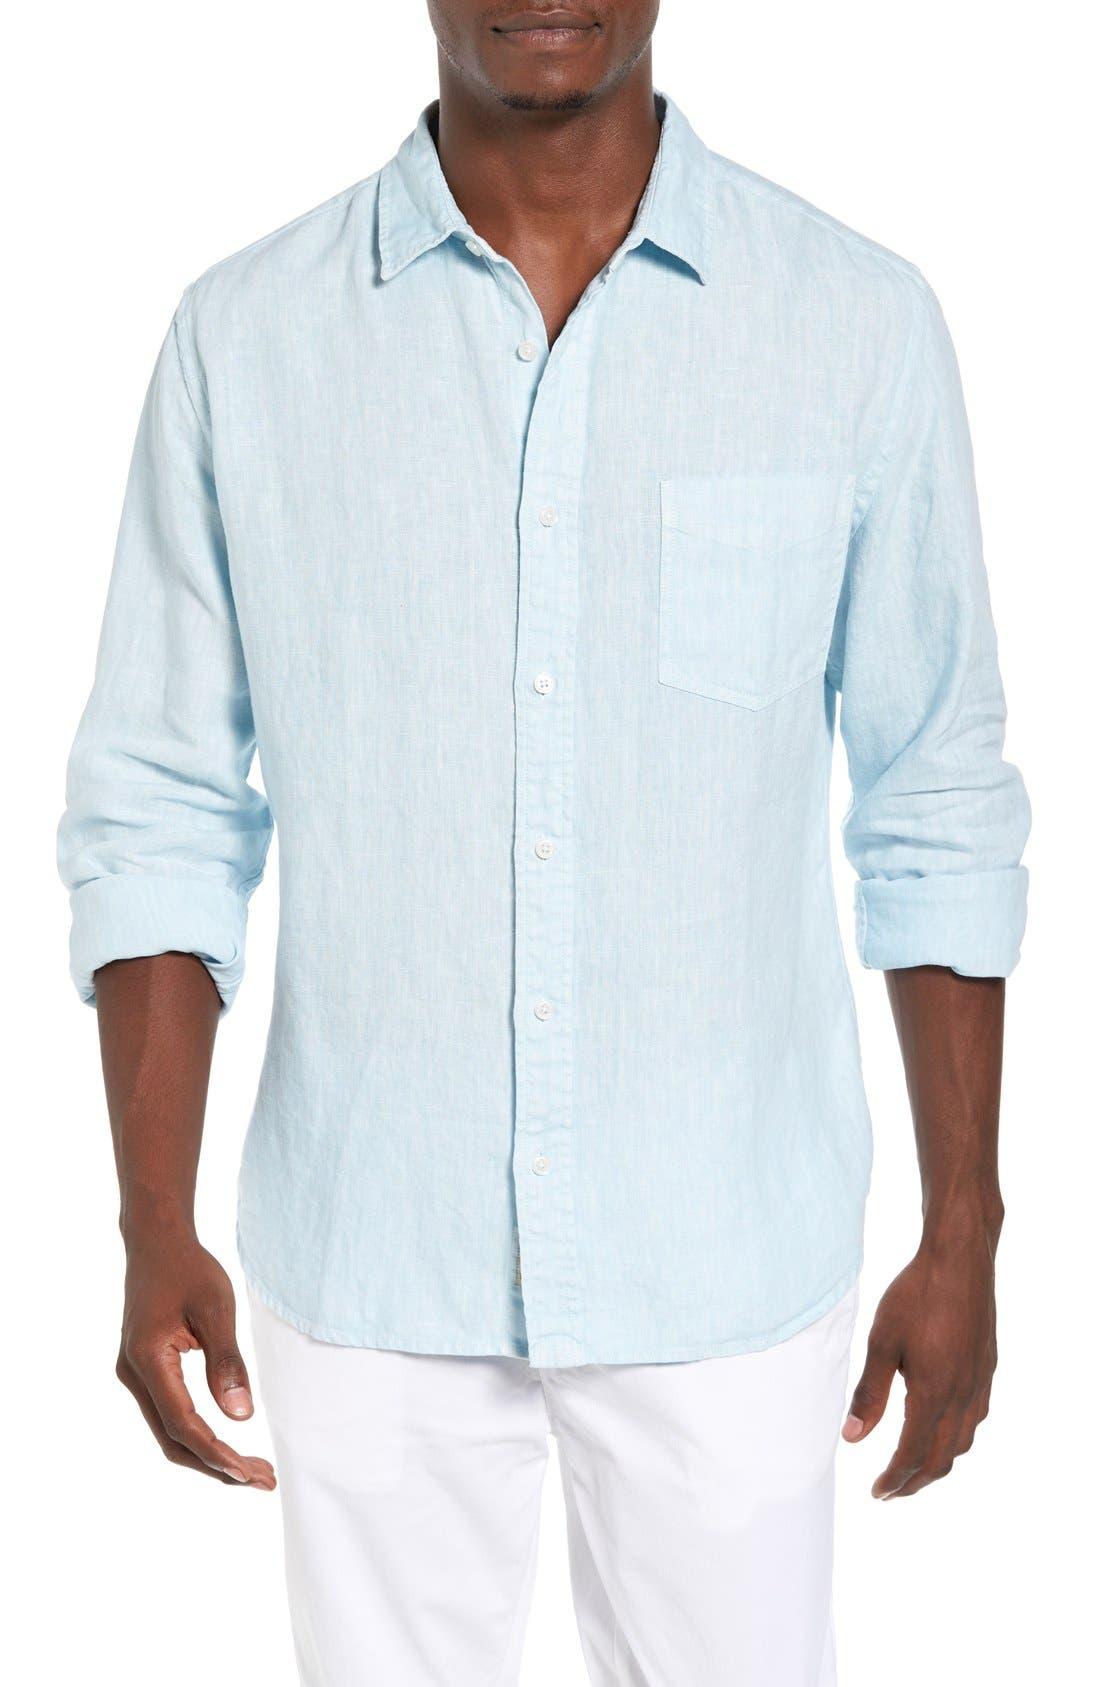 Alternate Image 1 Selected - Original Paperbacks Nice Trim Fit Linen Sport Shirt